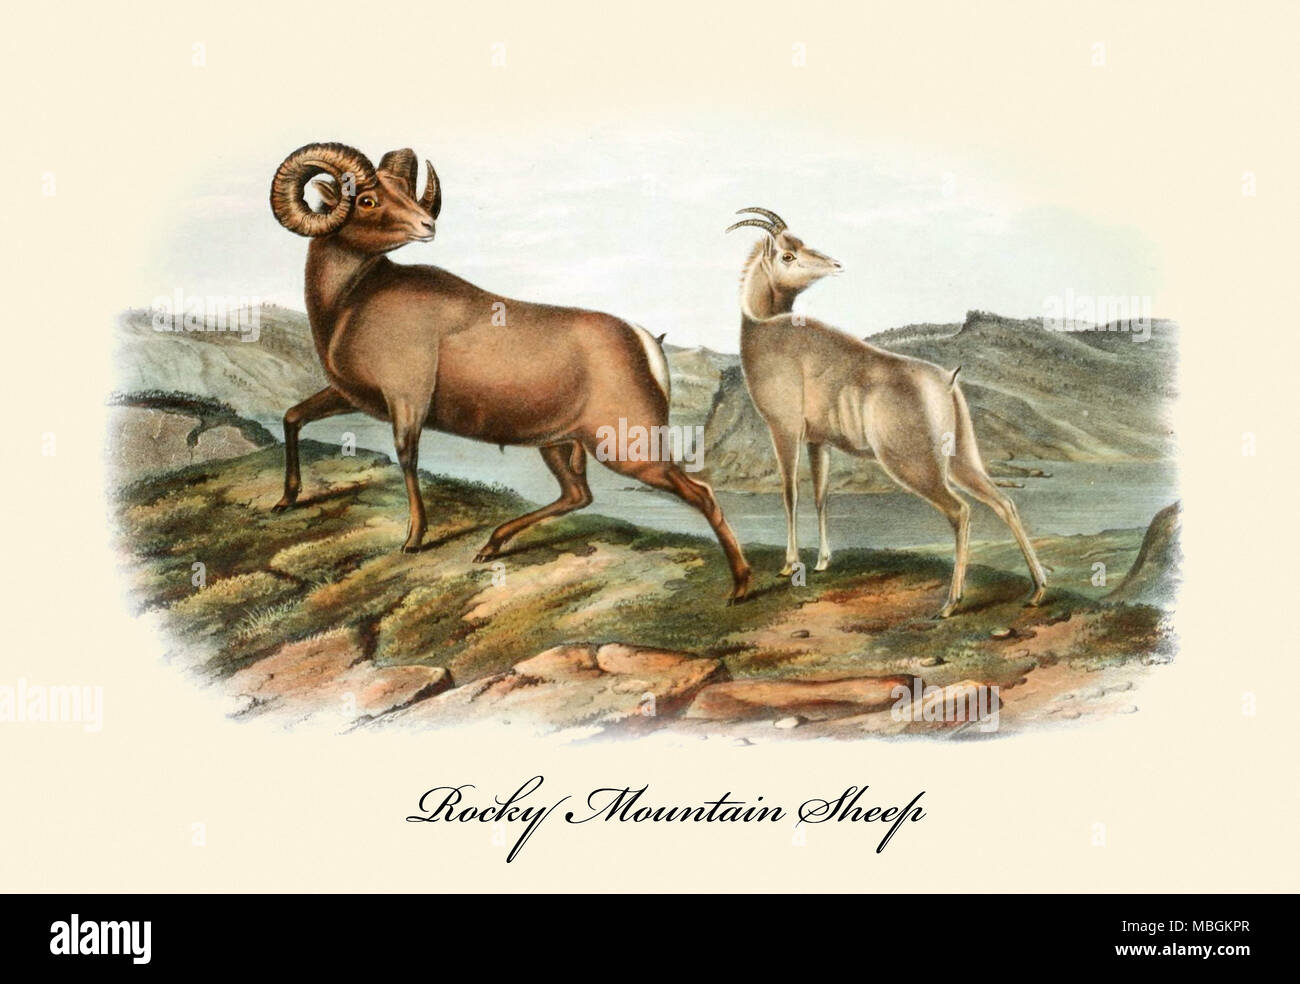 Rocky Mountain Sheep Photo Stock